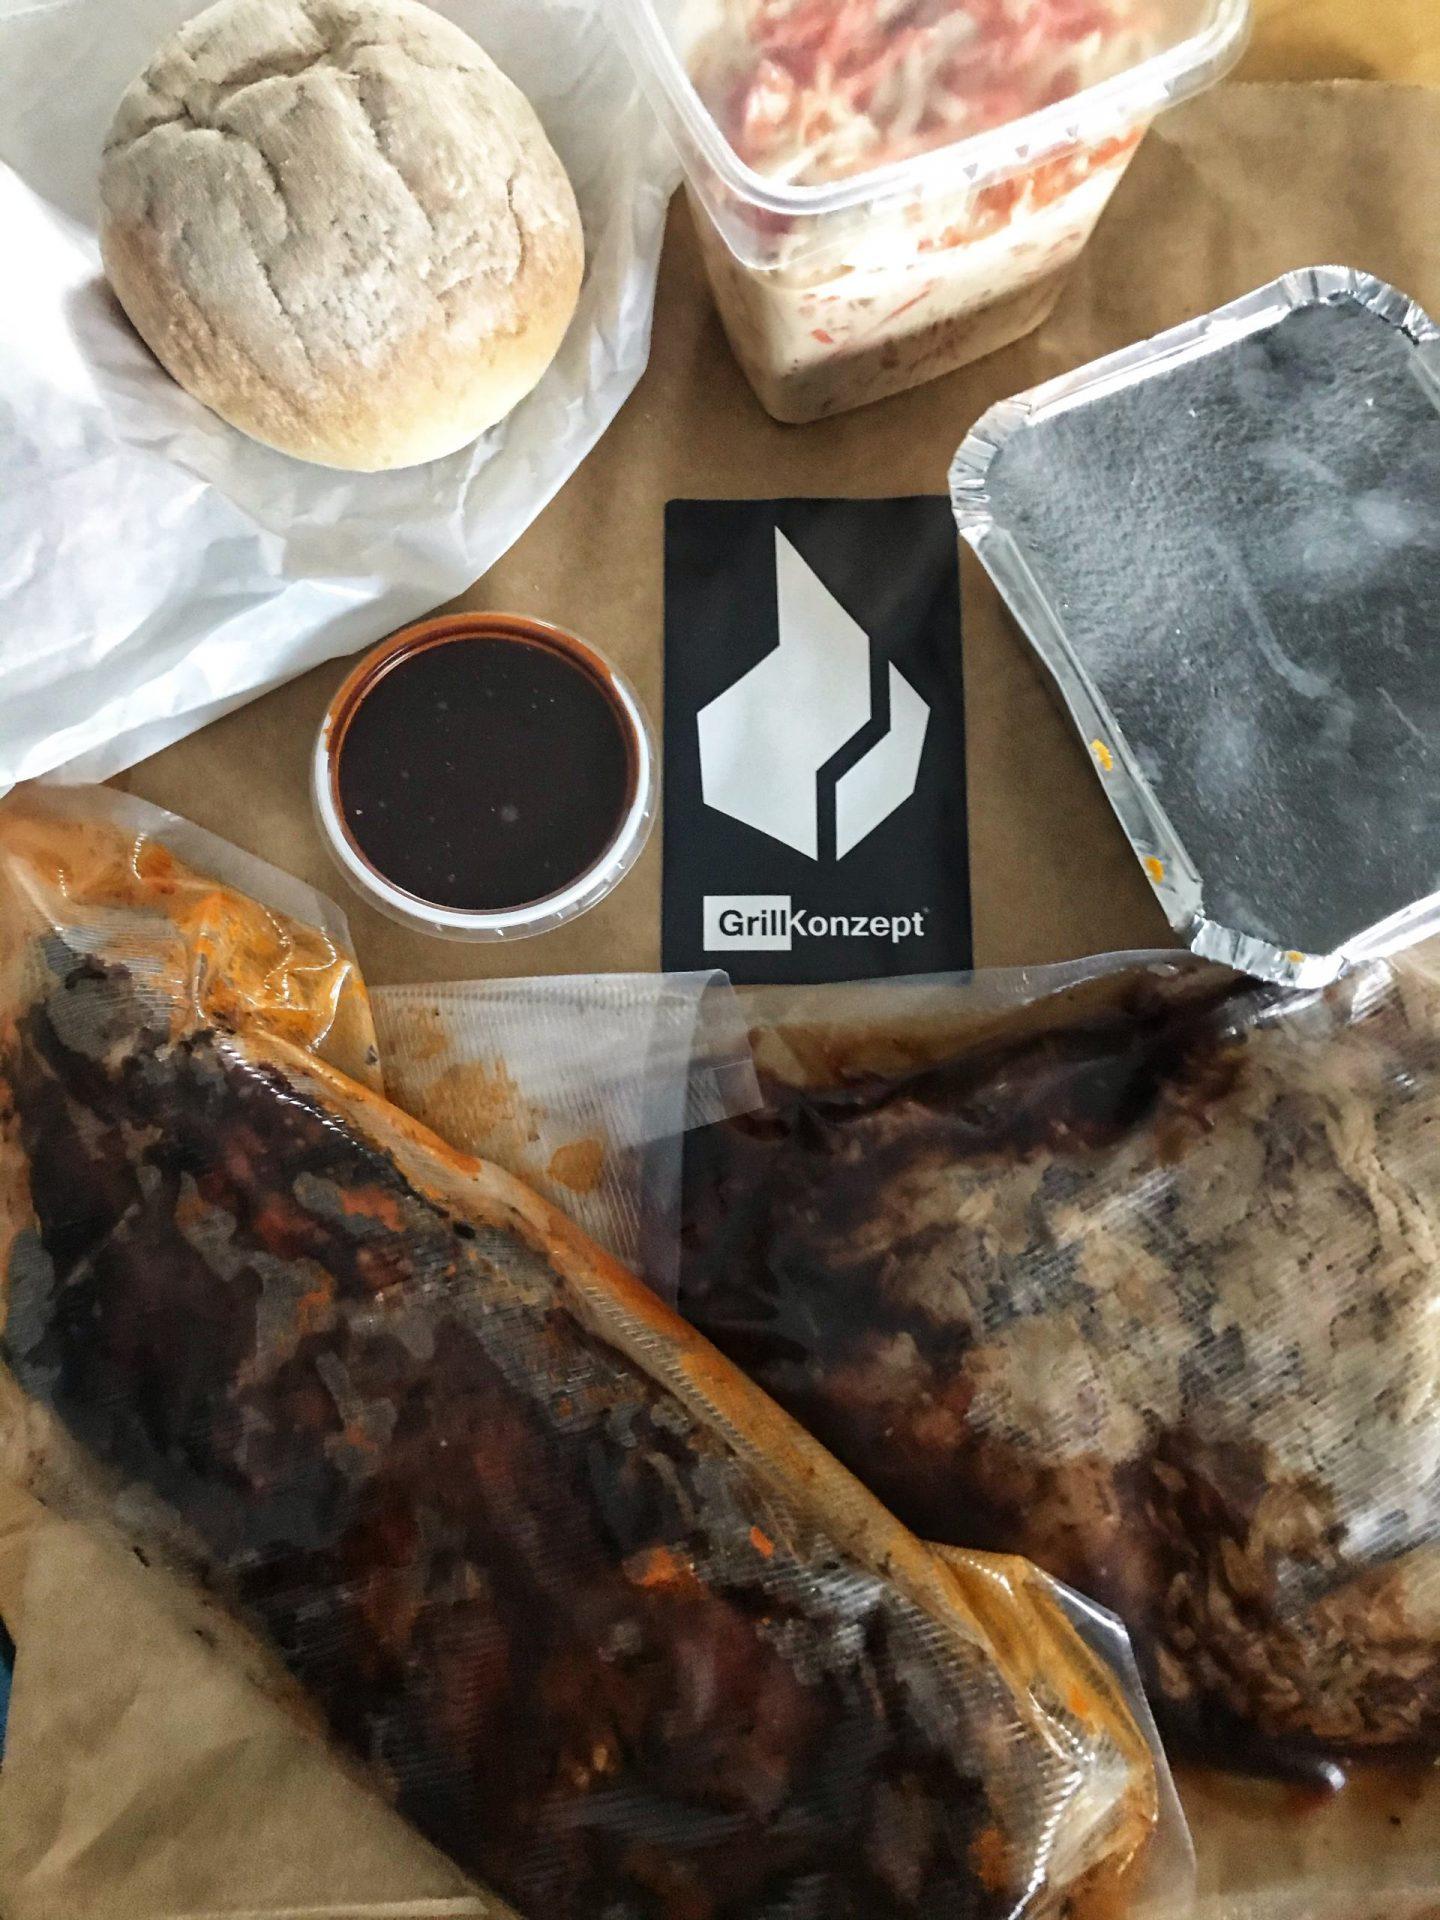 Erfahrung Bewertung Kritik Grillakademie Ruhr Bochum Pulled Pork Burger Spare Rips Foodblog Sternestulle